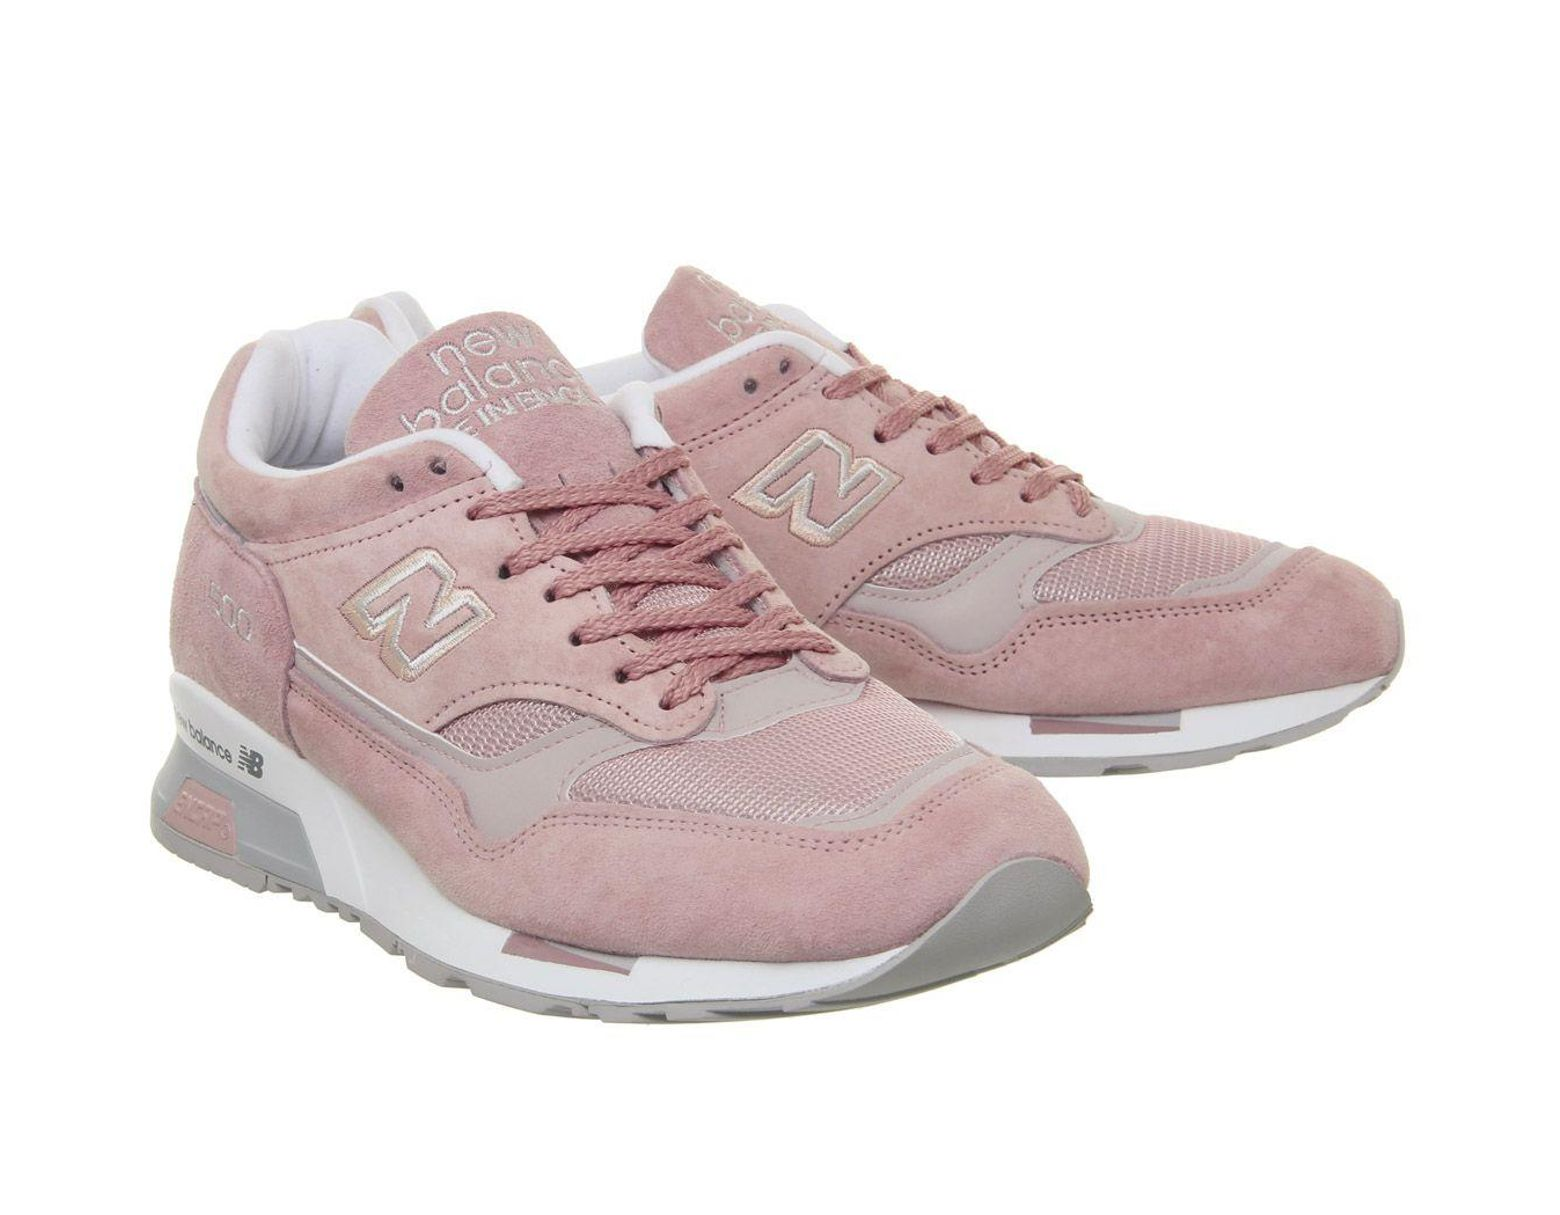 quality design 3d843 83e4b Men's M1500 Sneakers